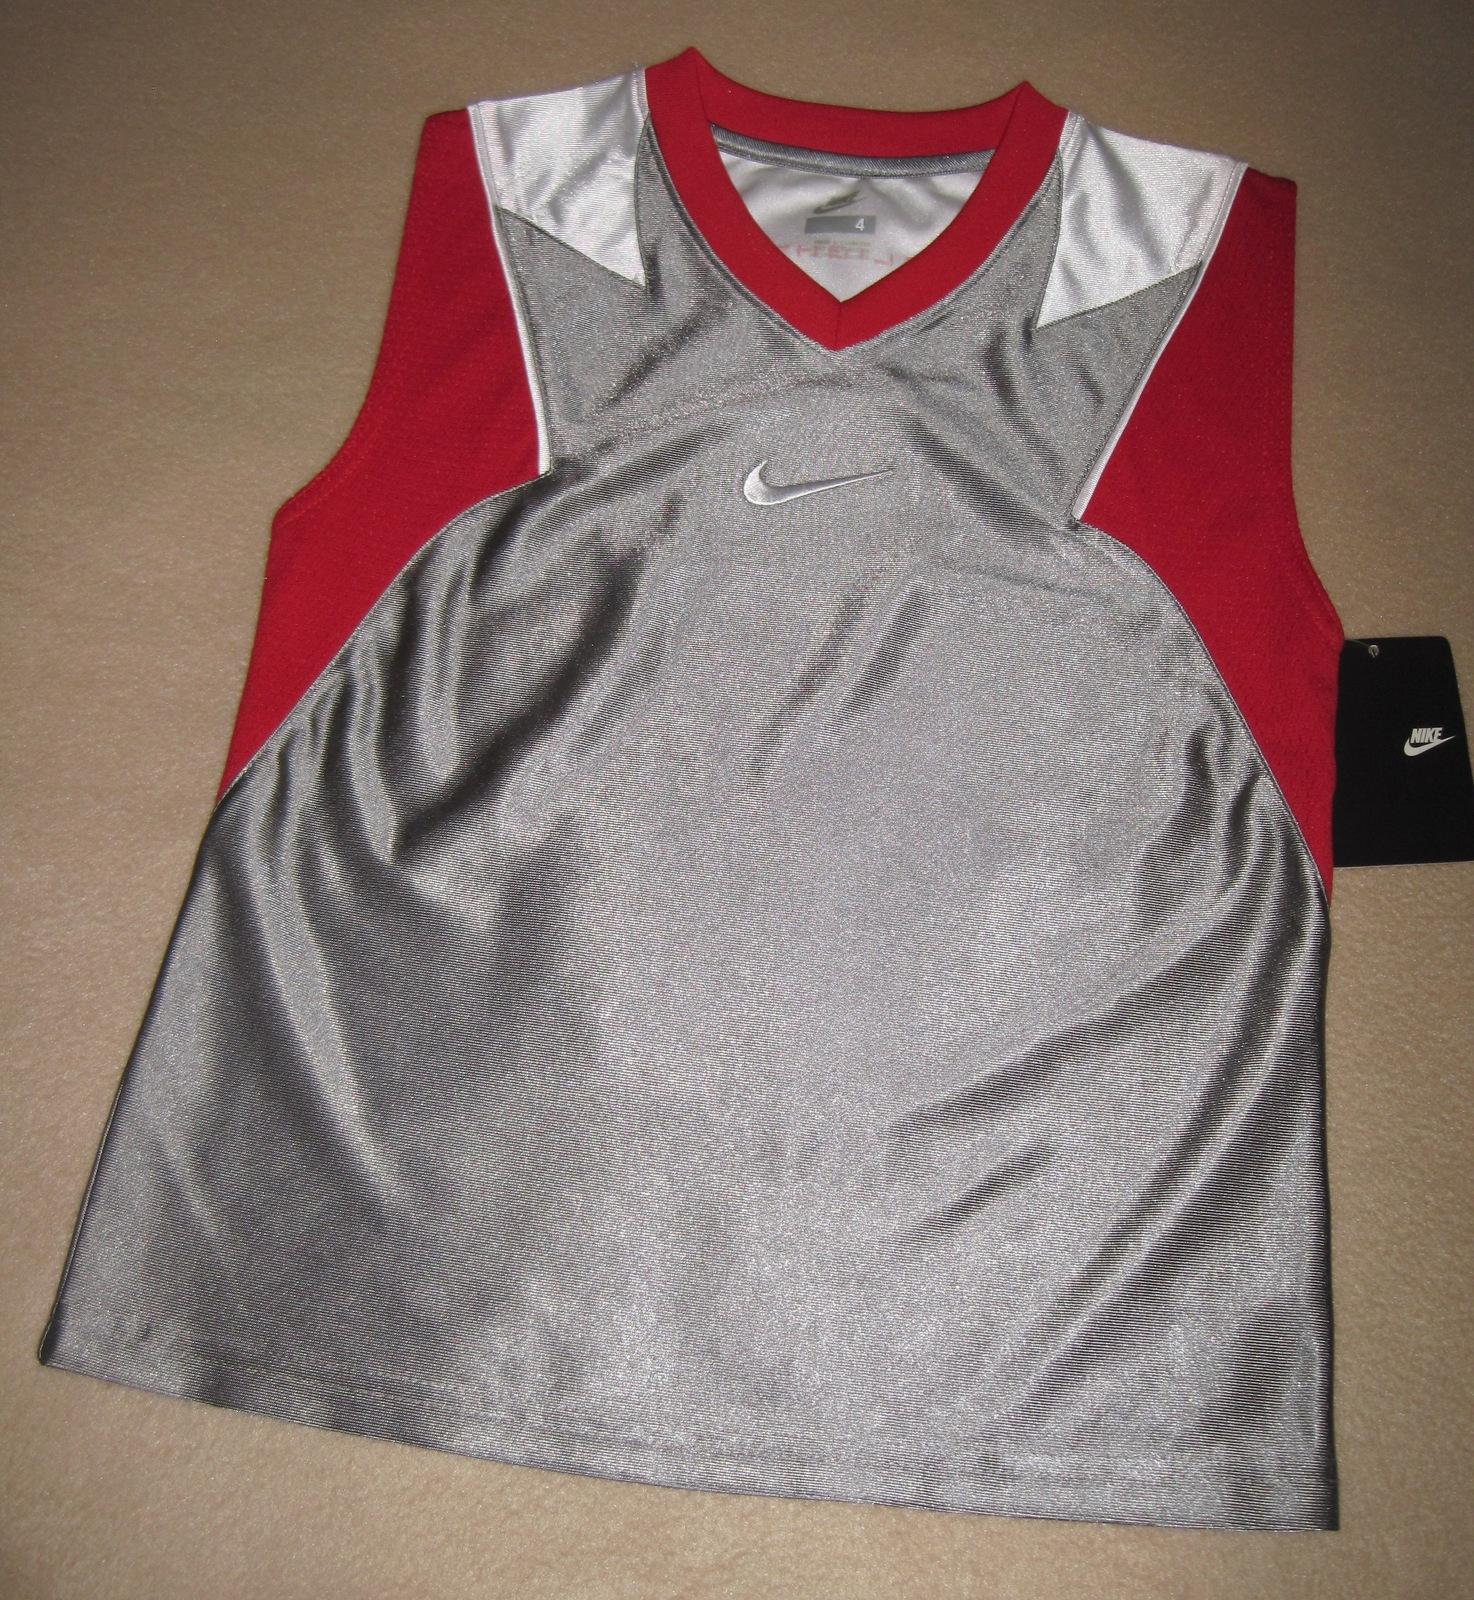 BOYS 7 - Nike - Flight Grey-Red-White BASKETBALL SPORTS JERSEY